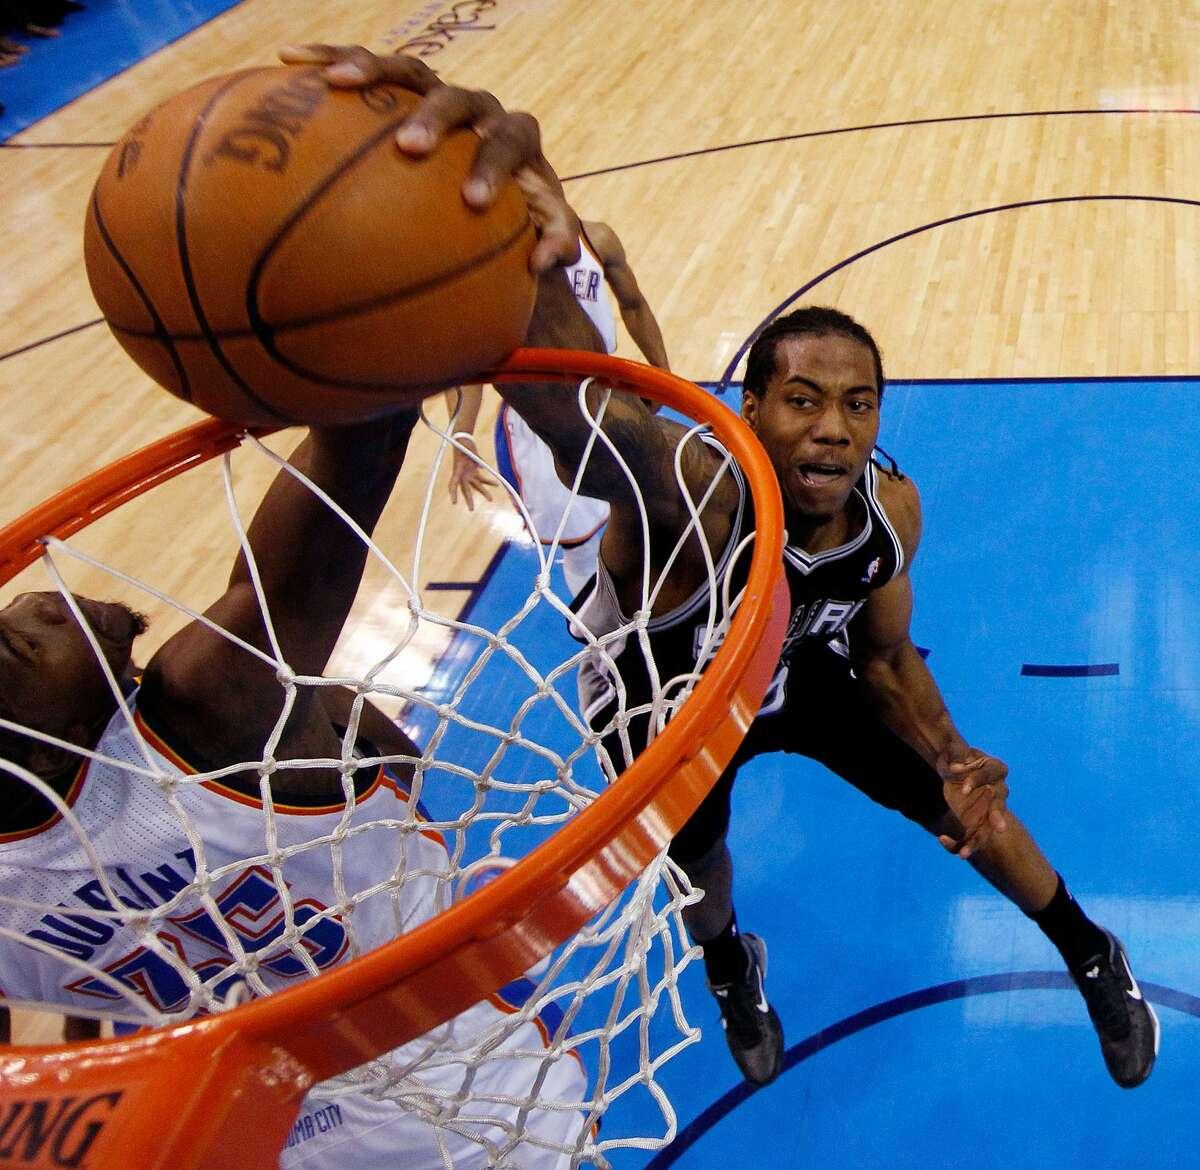 Mar. 16, 2012 : Spurs 114, Thunder 105 Durant: 25 points (8-19 FG/2-8 3PT), 7 rebounds, 3 assists, 2 steals, 2 blocks, 5 turnovers Leonard: 15 points (5-9 FG/2-4 3PT), 5 rebounds, 3 steals, 2 turnovers